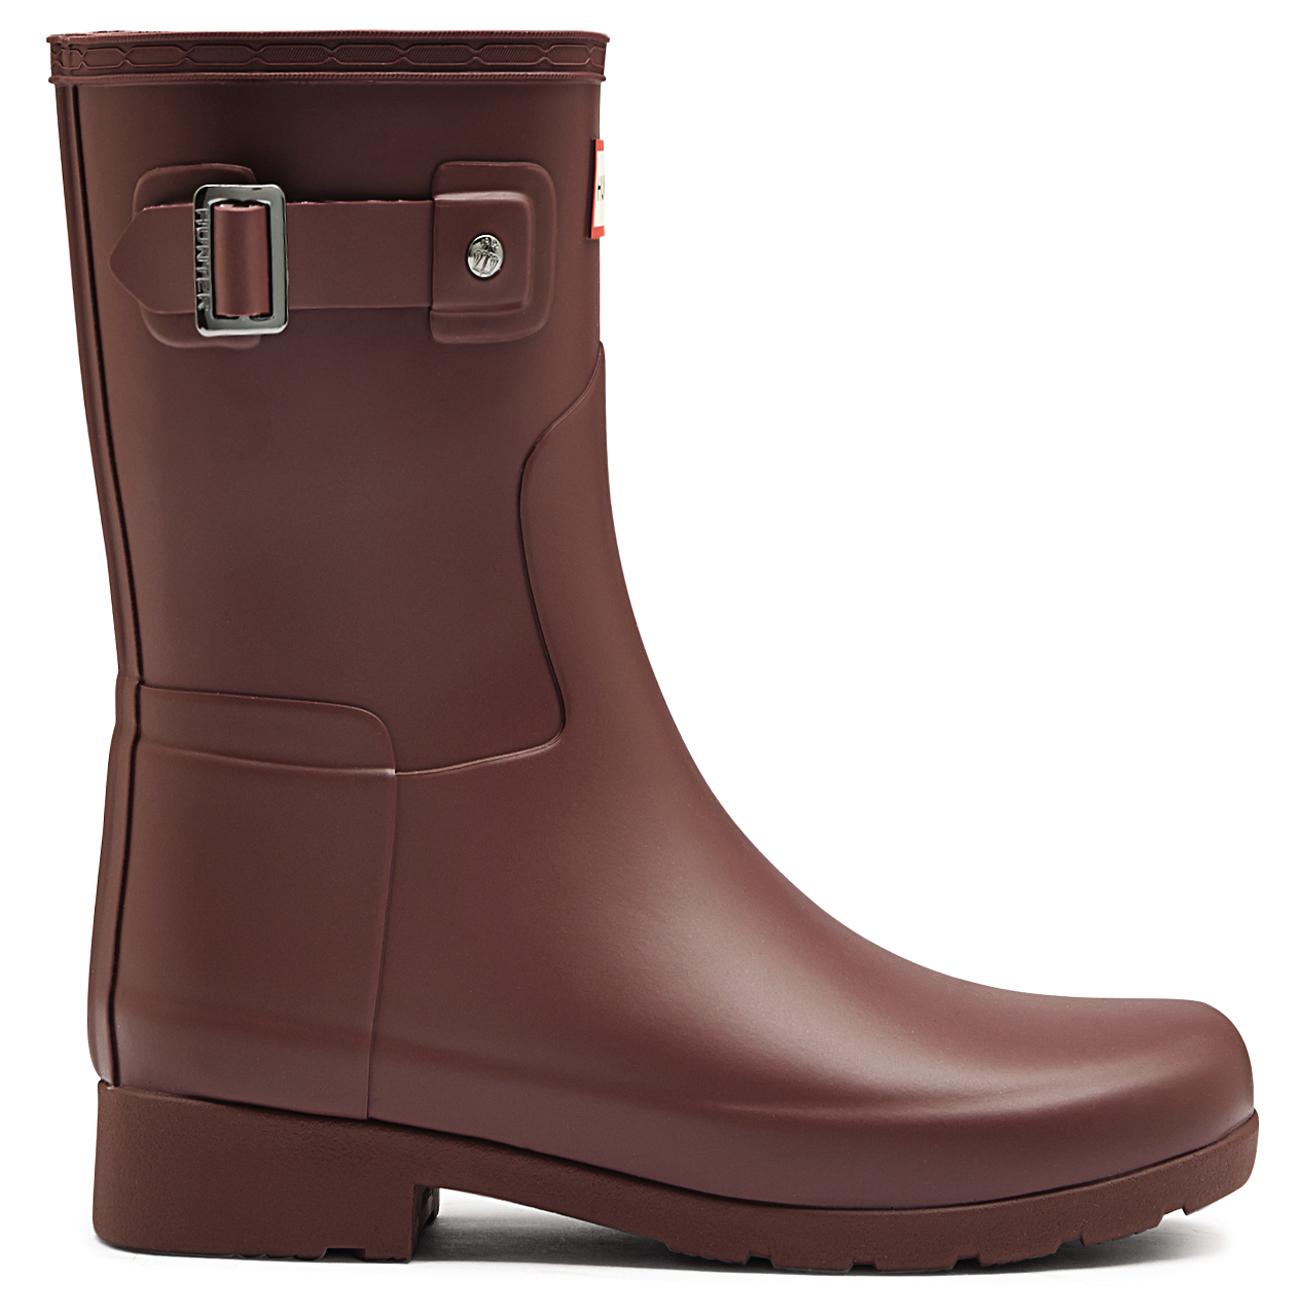 Elegant Outdoorkit Sneak Preview #12 The Hunter Womenu0026#39;s Original Snow Quilt Boots